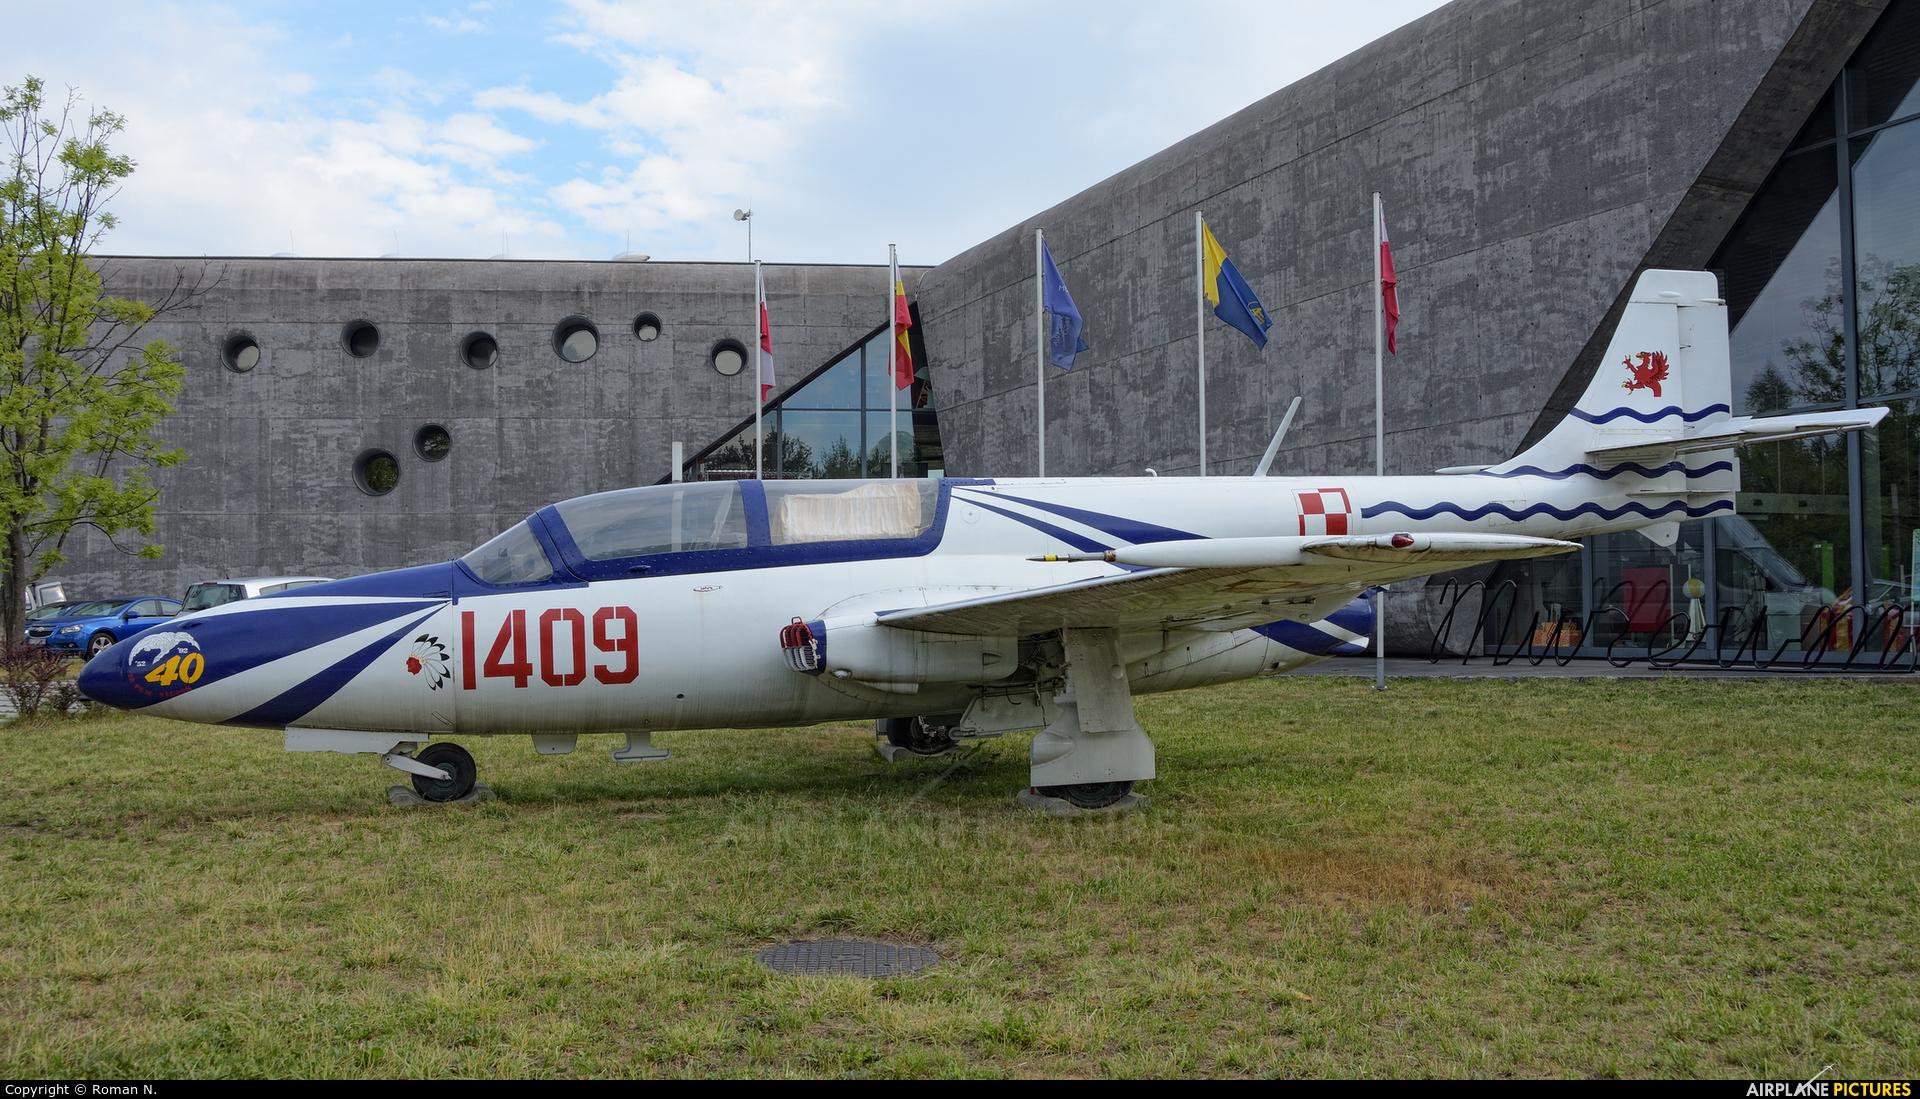 Poland - Air Force 1409 aircraft at Kraków, Rakowice Czyżyny - Museum of Polish Aviation